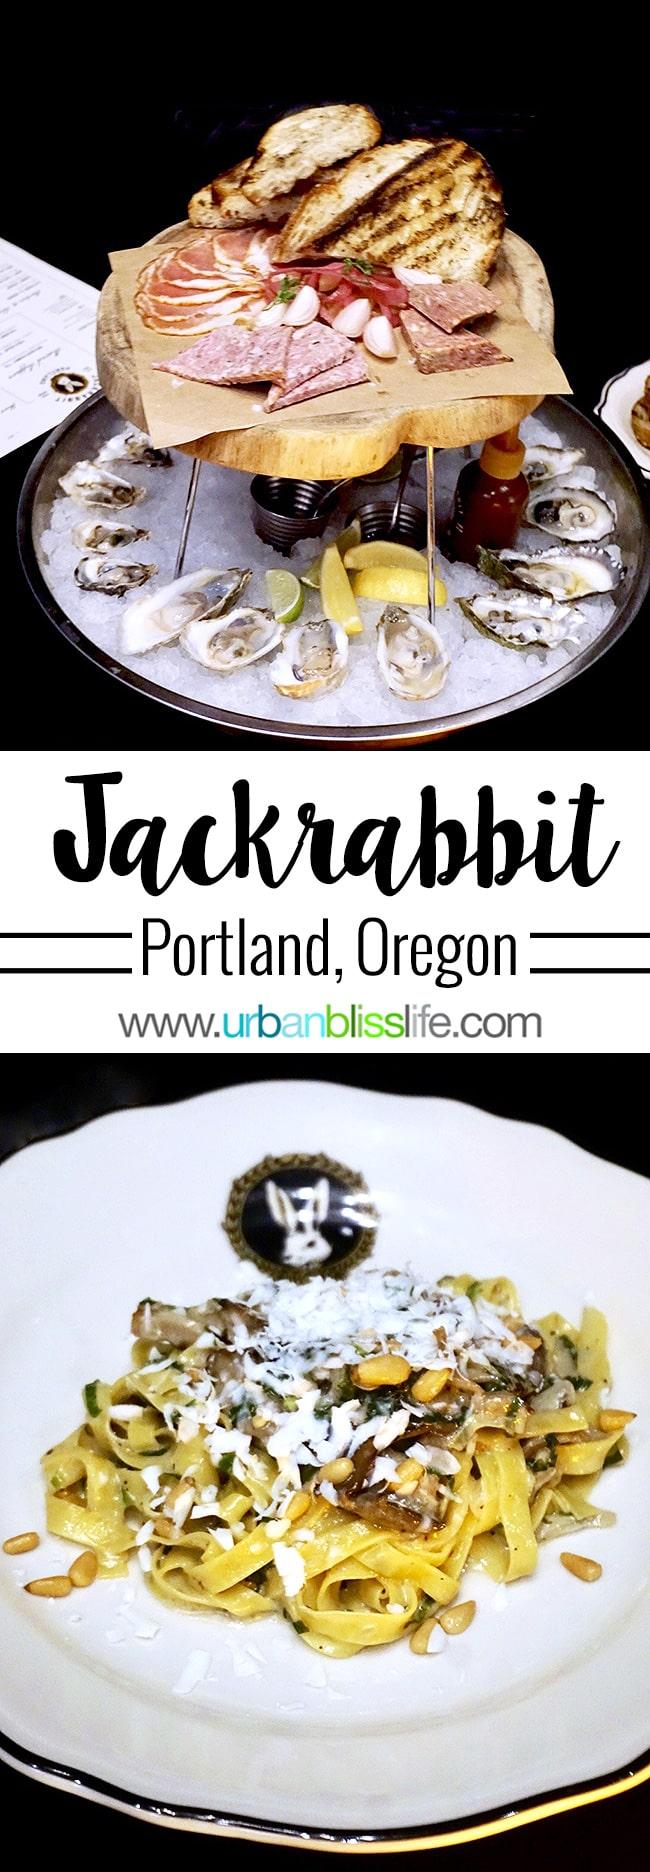 Jackrabbit restaurant charcuterie and bread